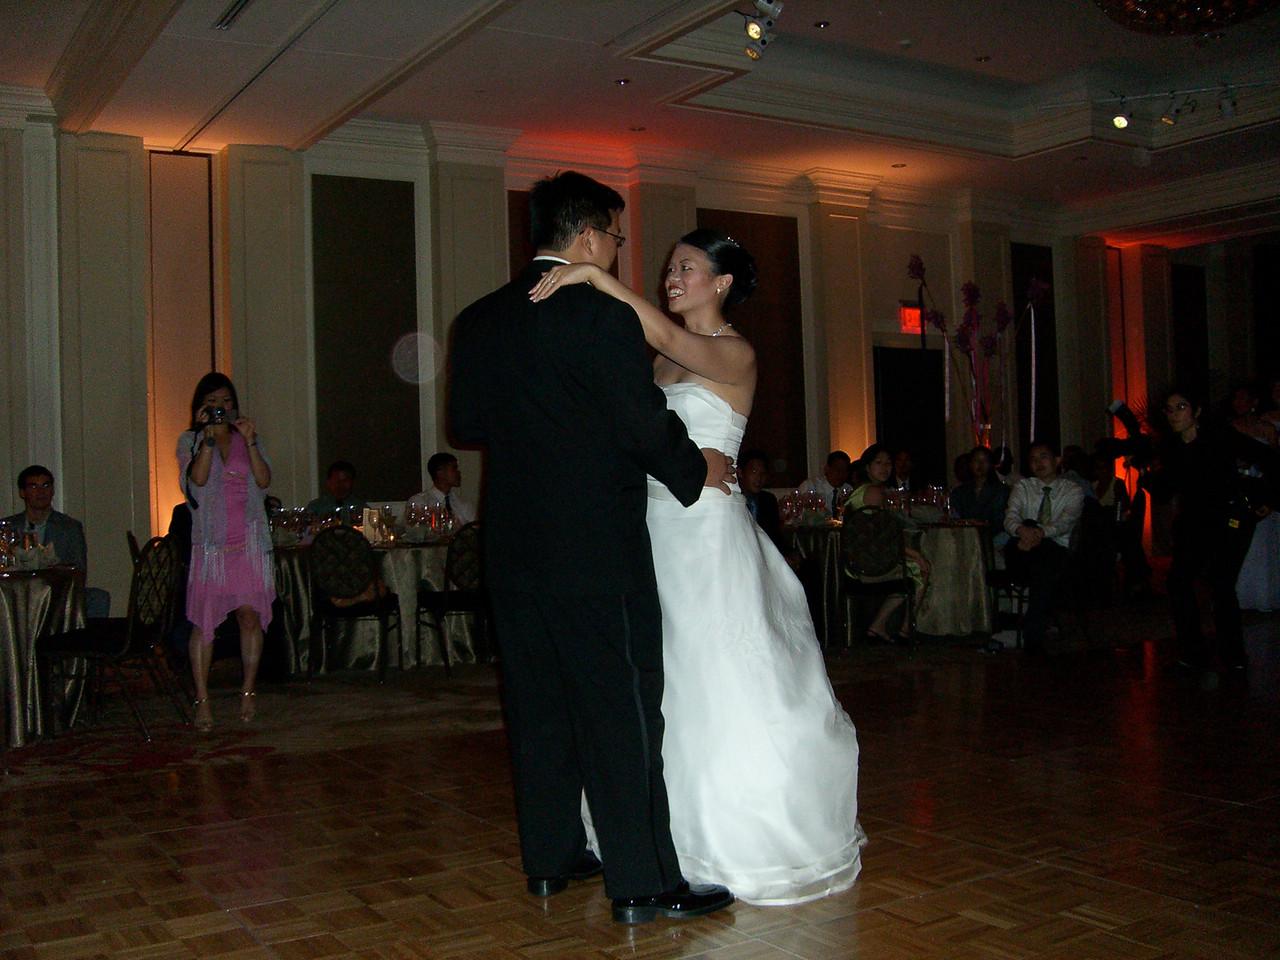 Reception - First dance 1